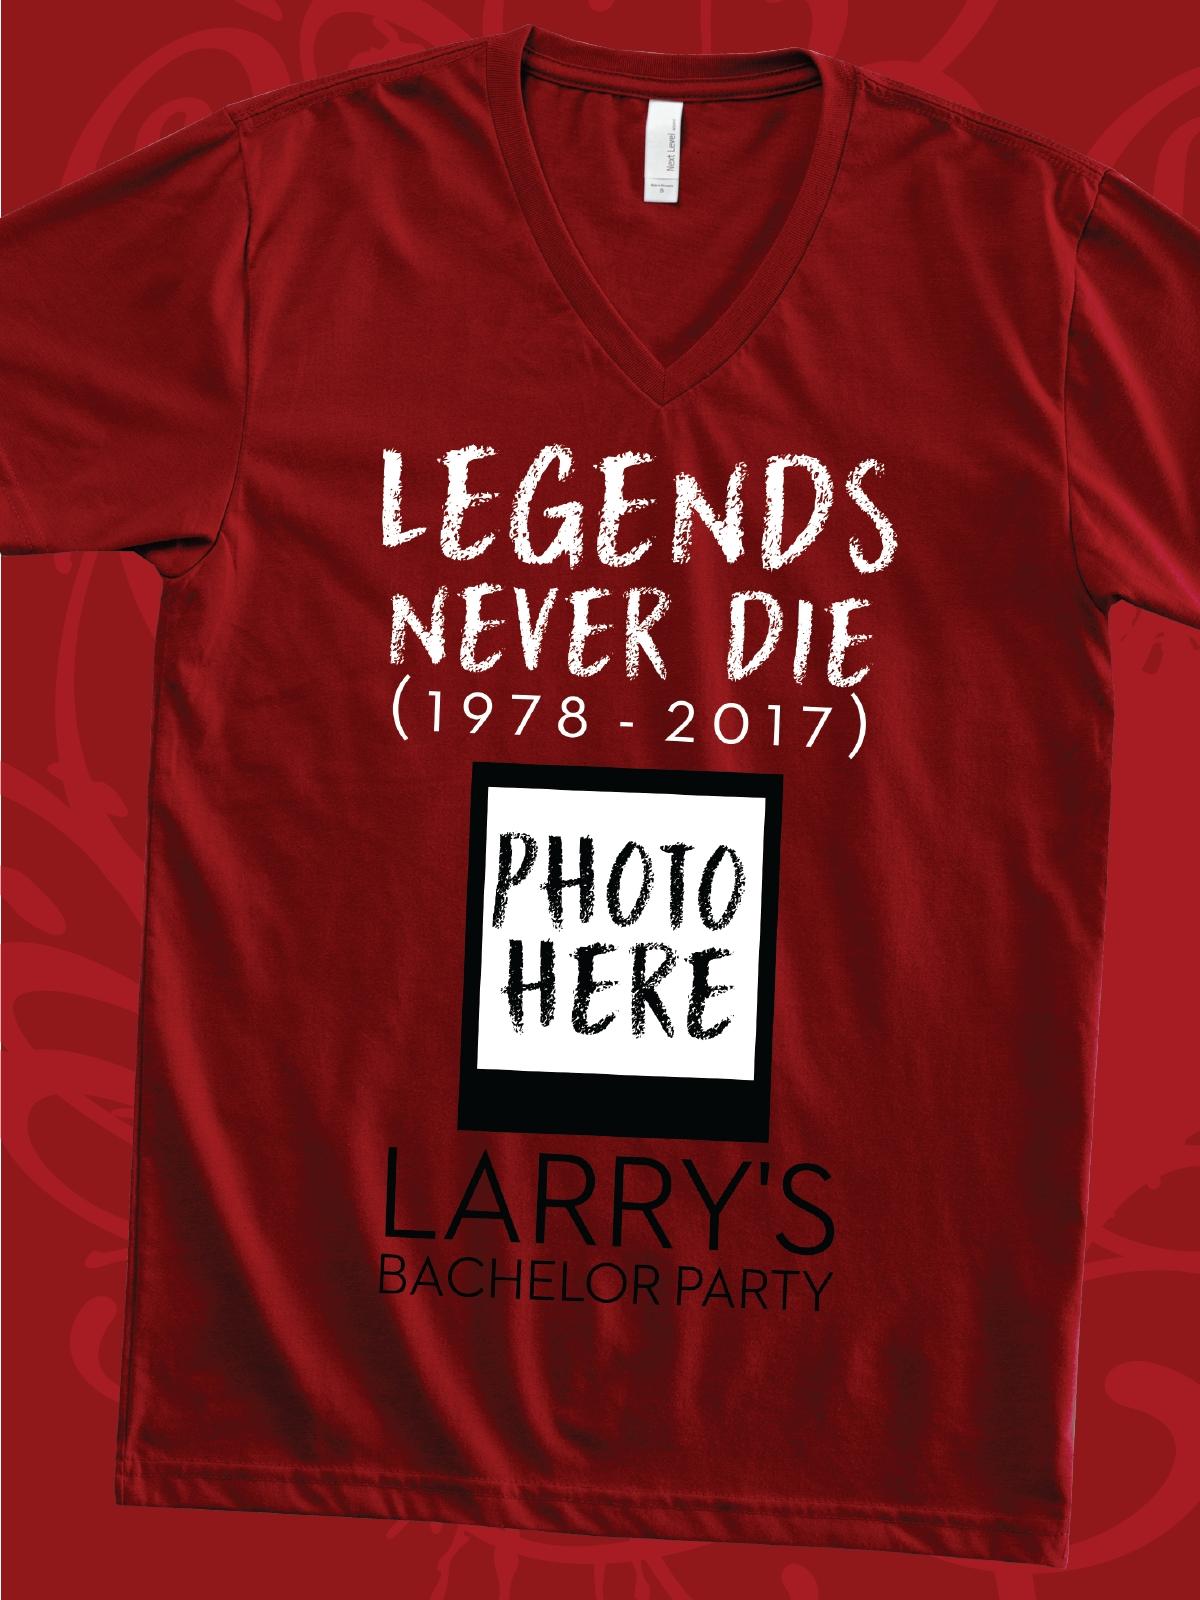 10 Ideal Bachelor Party T Shirt Ideas legends never die design idea for custom bachelor party t shirts 2020